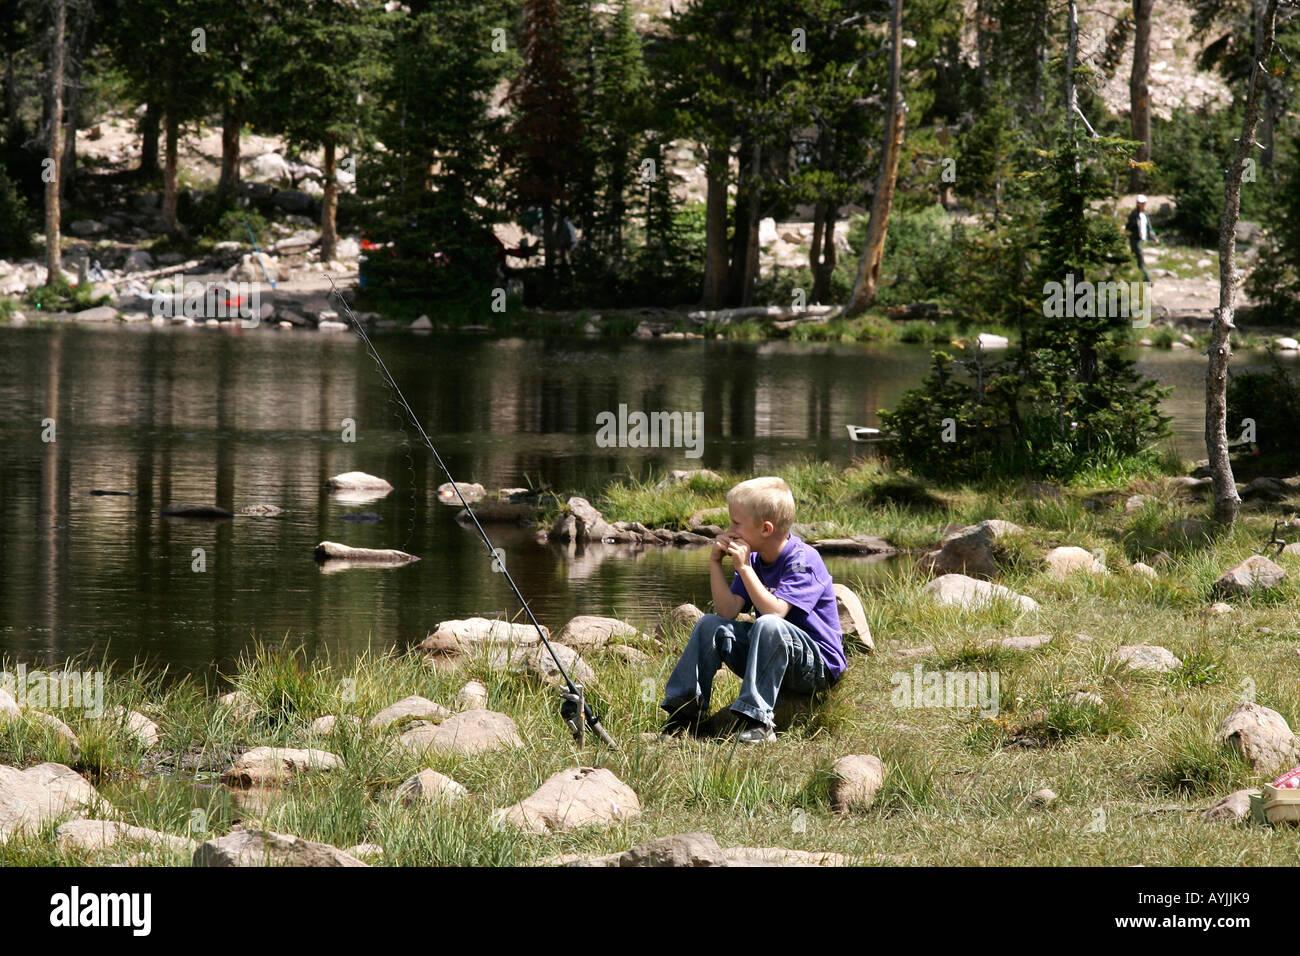 Young boy fishing on a High mountain lake, high Uintahs, Utah Aug 2005 - Stock Image